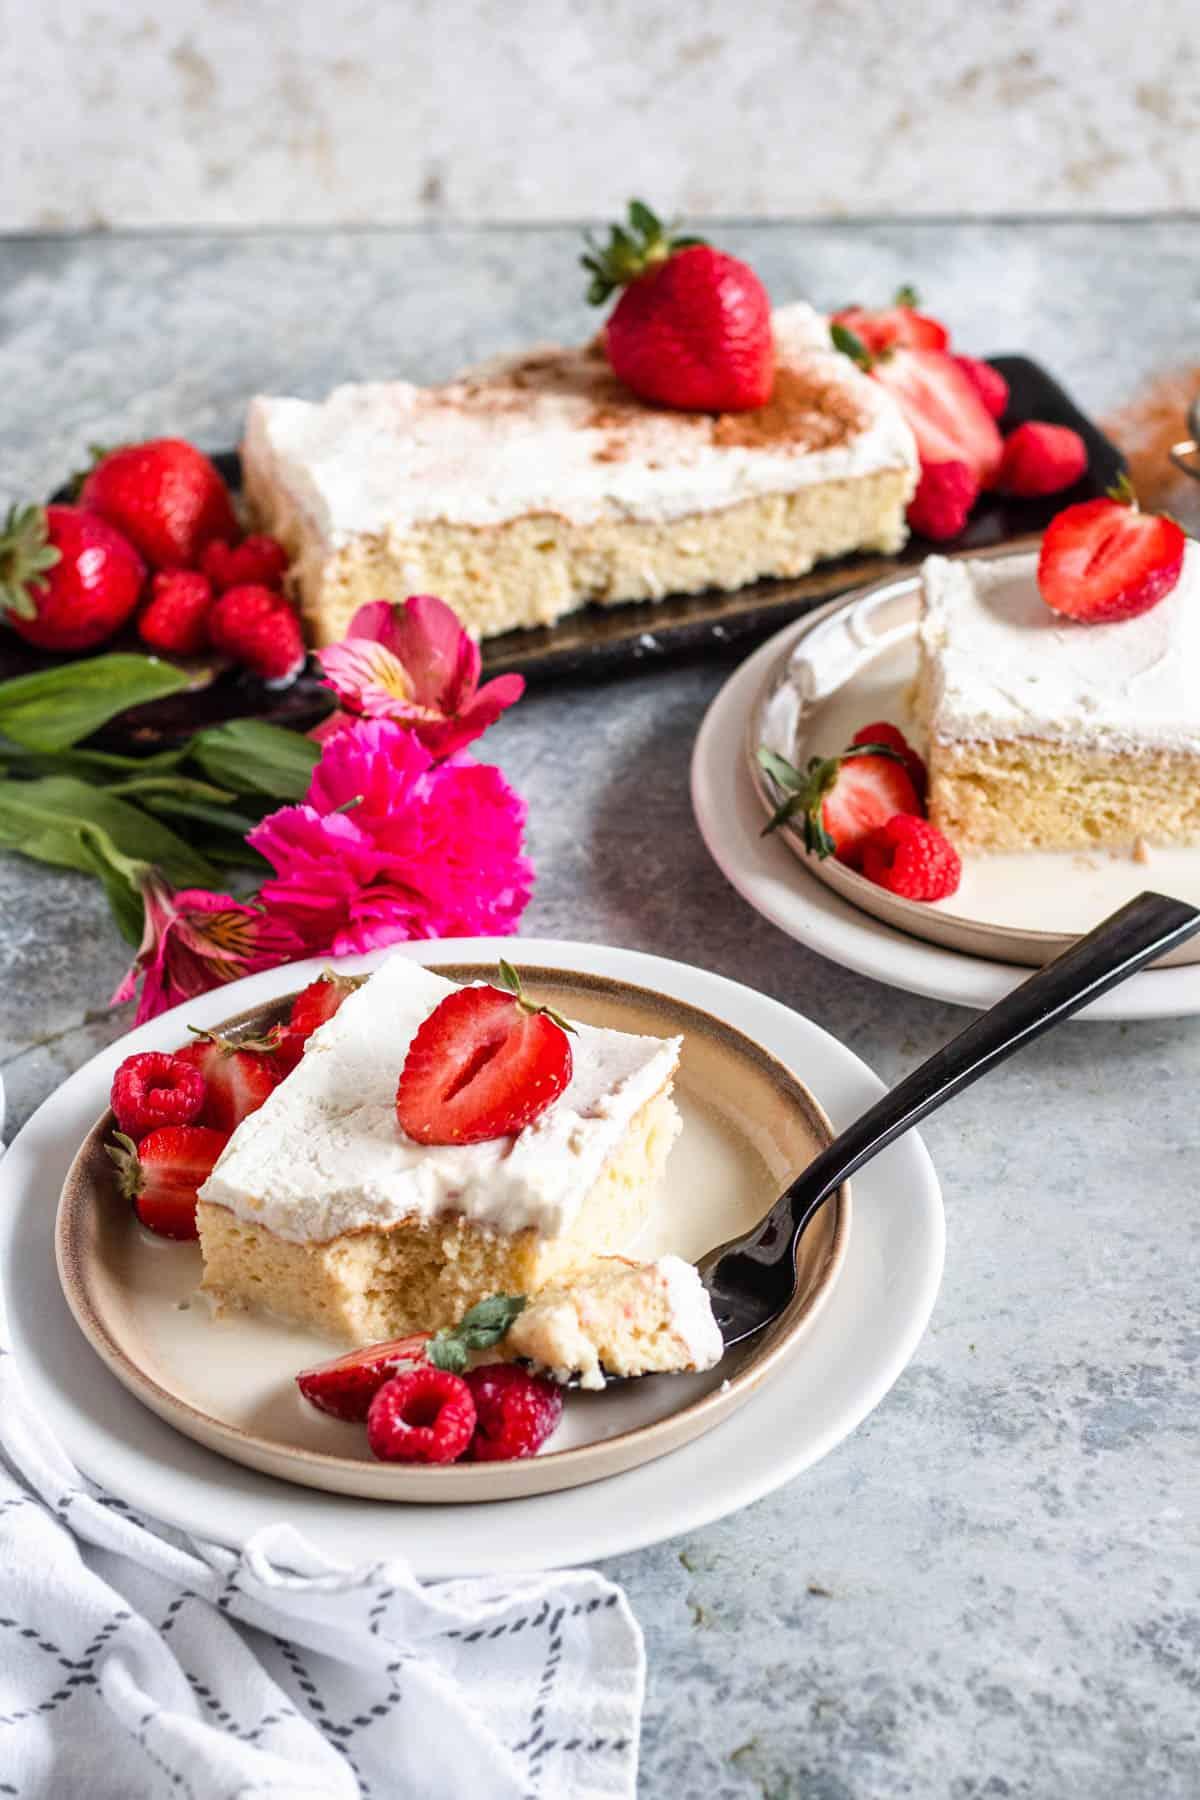 2 plates of cake